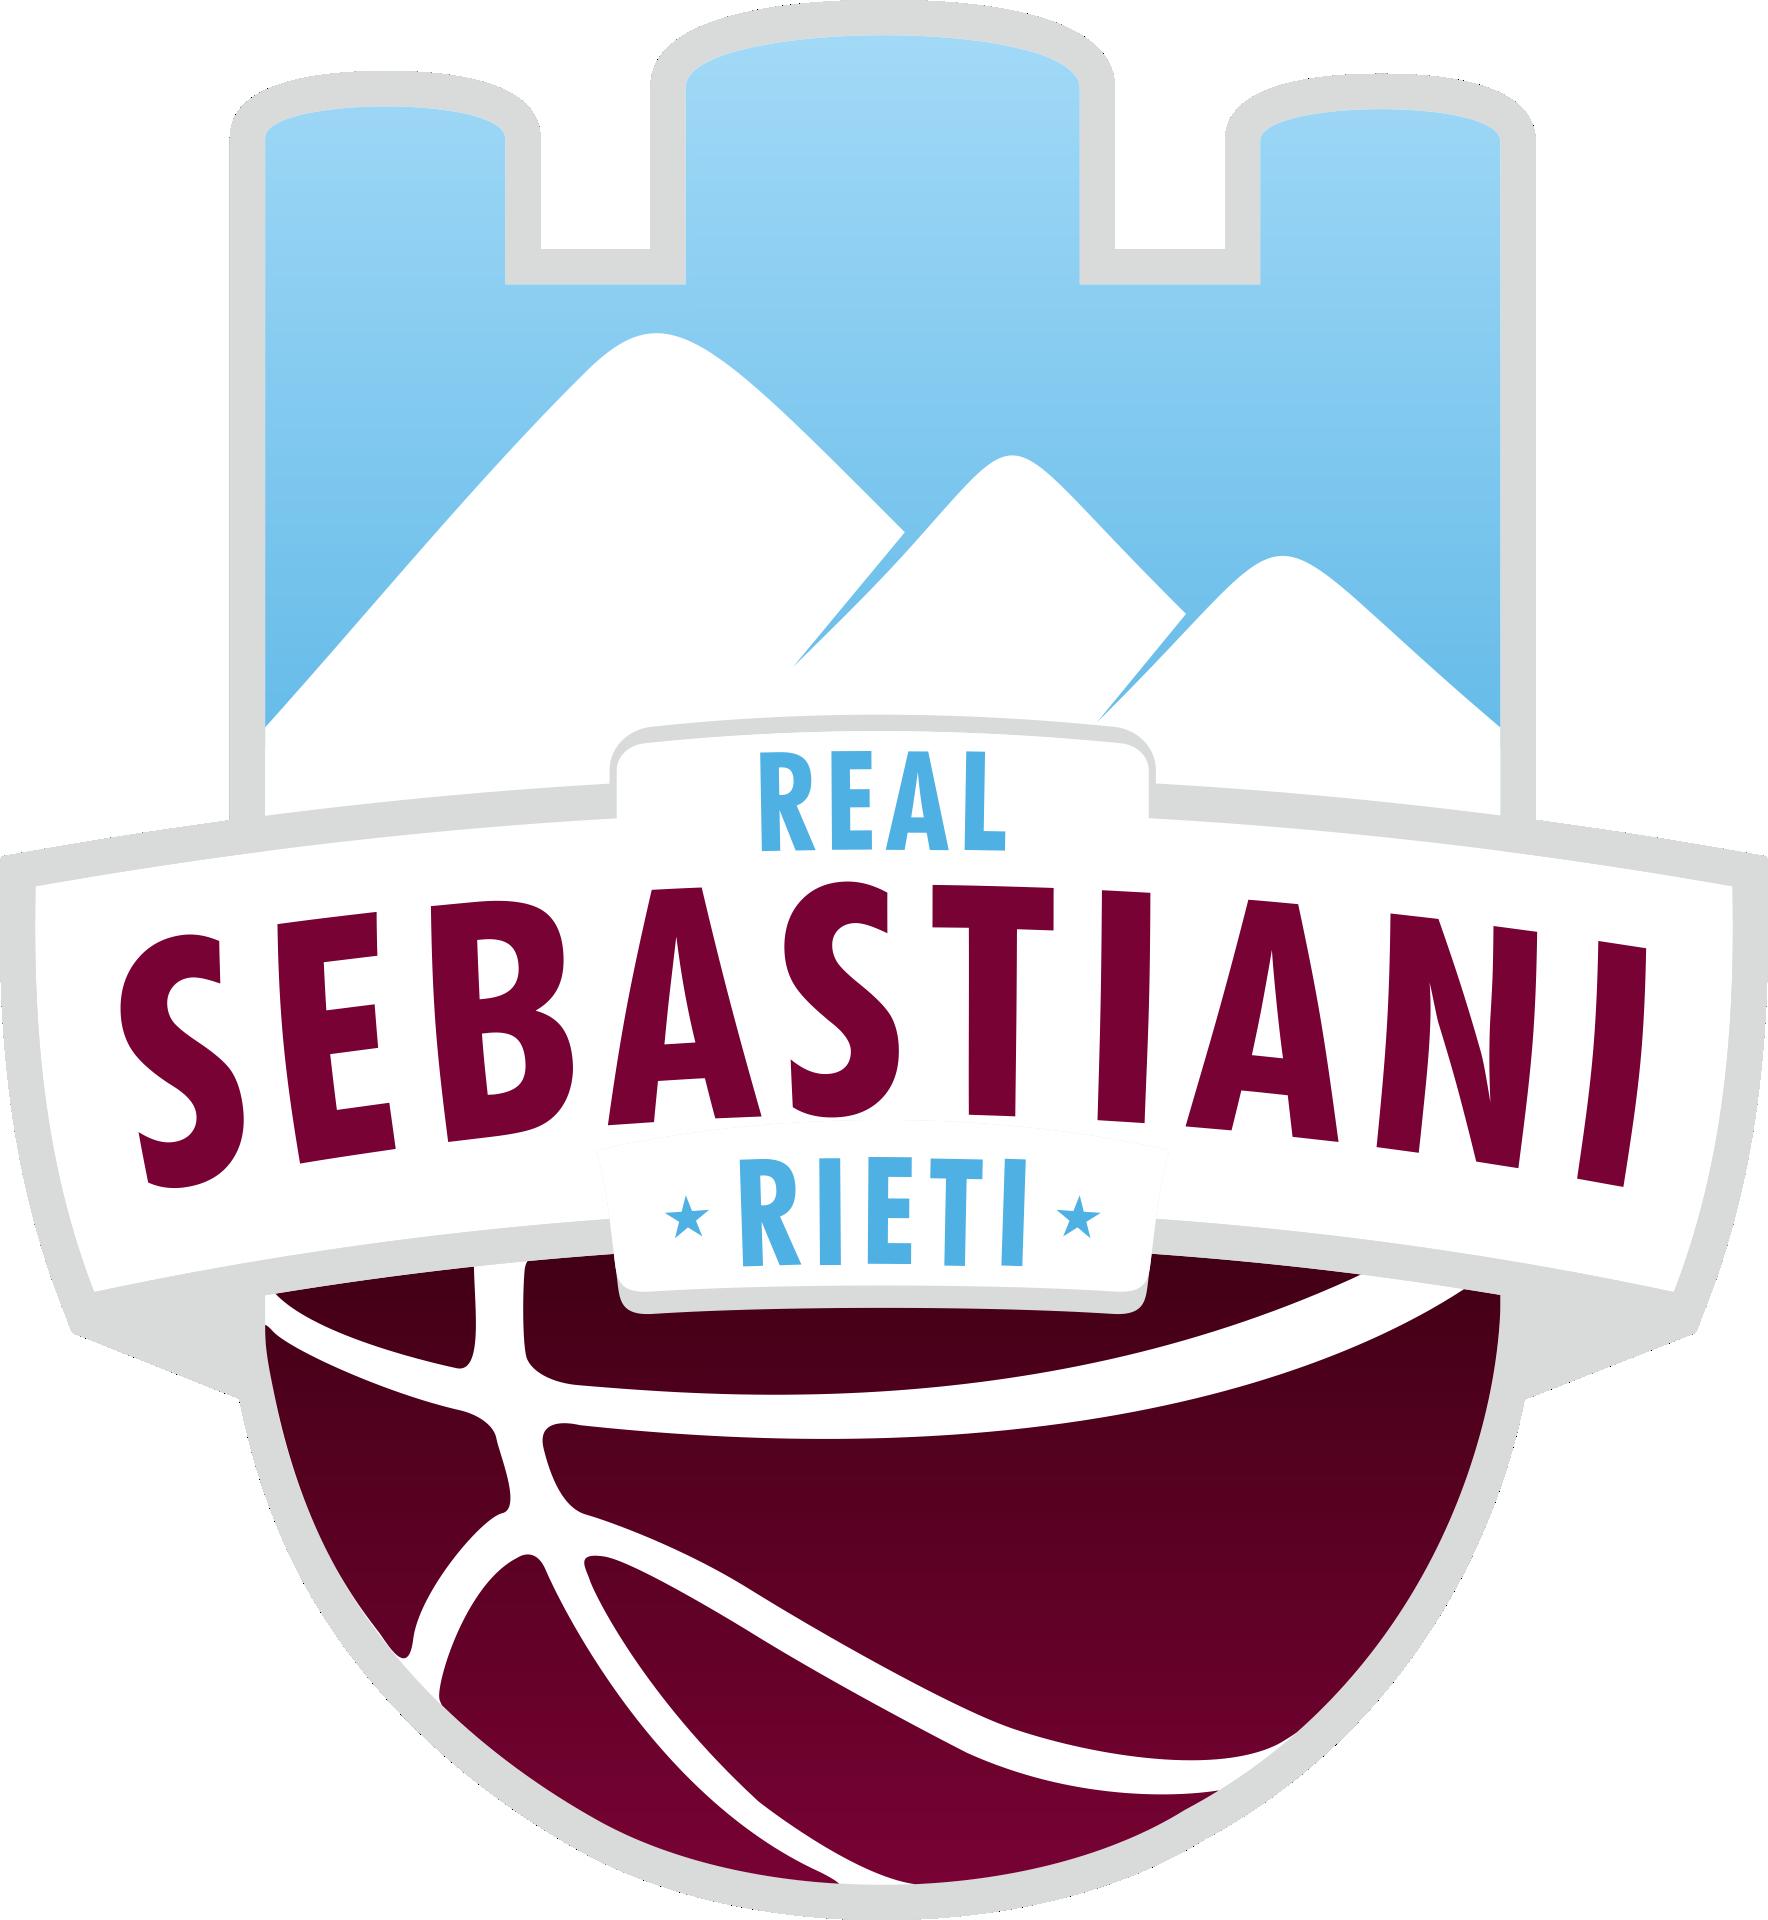 Real Sebastiani Rieti